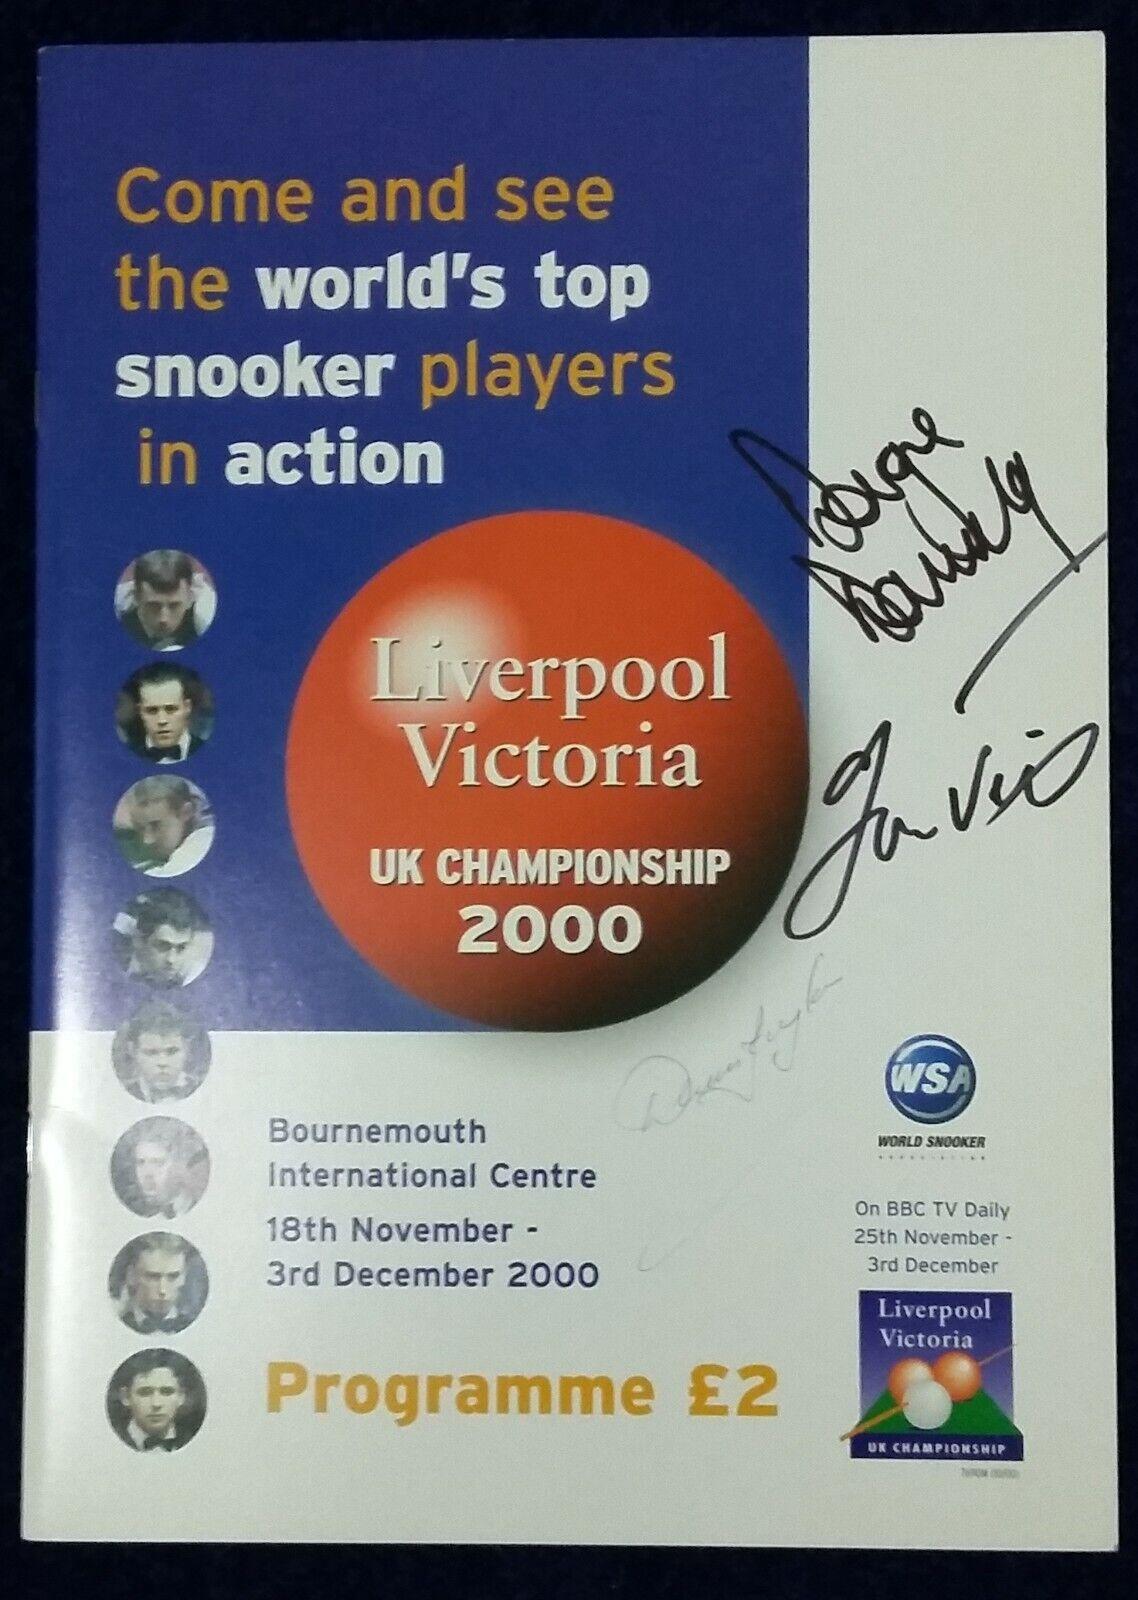 UK Snooker Championship 2000 Programme